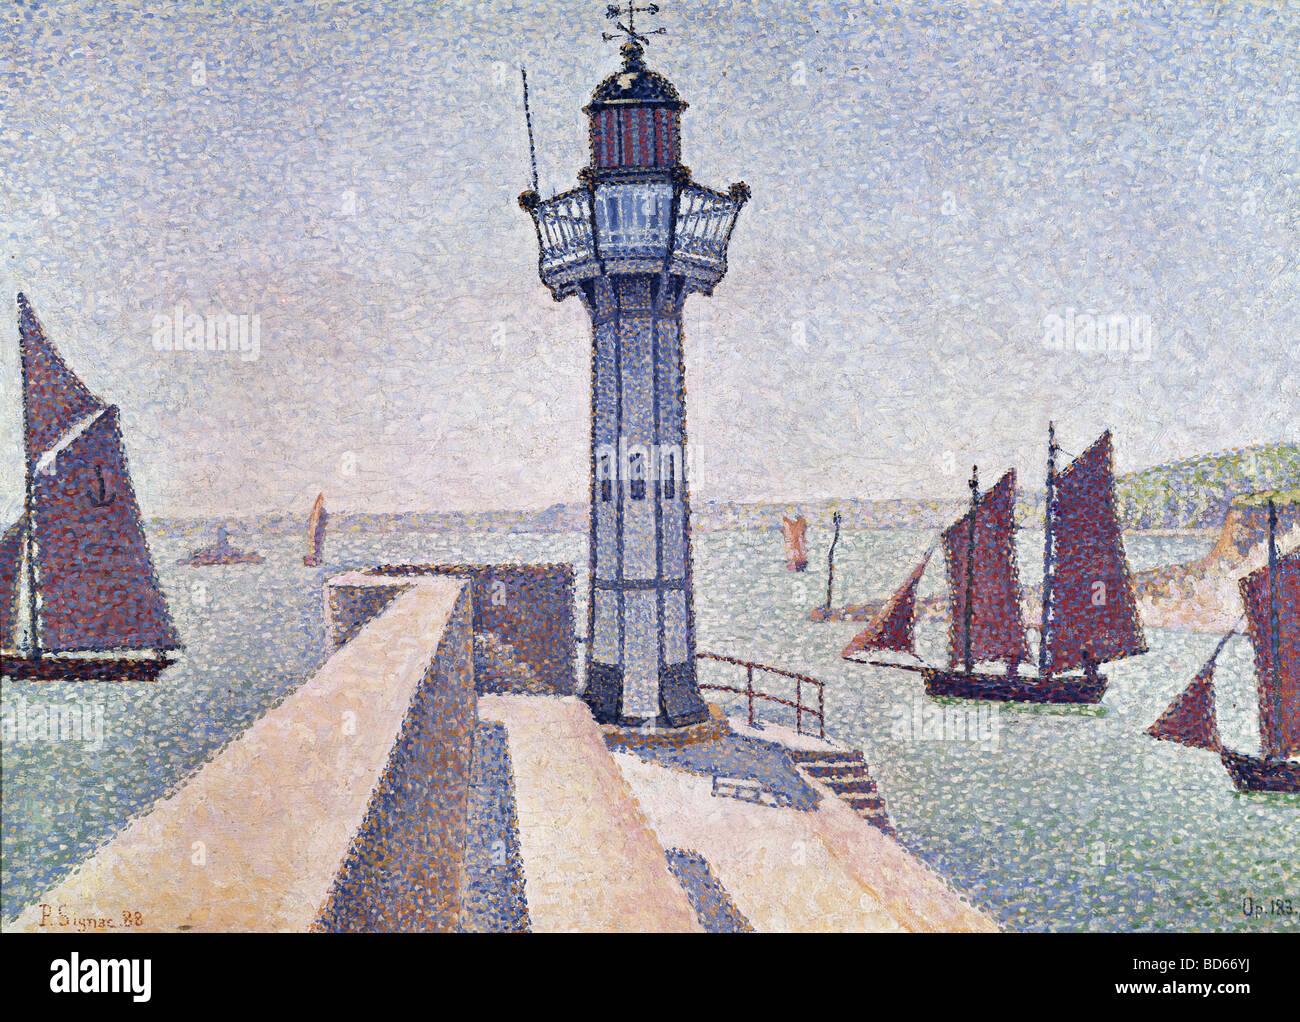 "fine arts, Signac, Paul, (1863 - 1935), painting, ""Portrieux, Le Phare"", 1888, Rijksmuseum Kröller-Müller, Otterlo, Stock Foto"